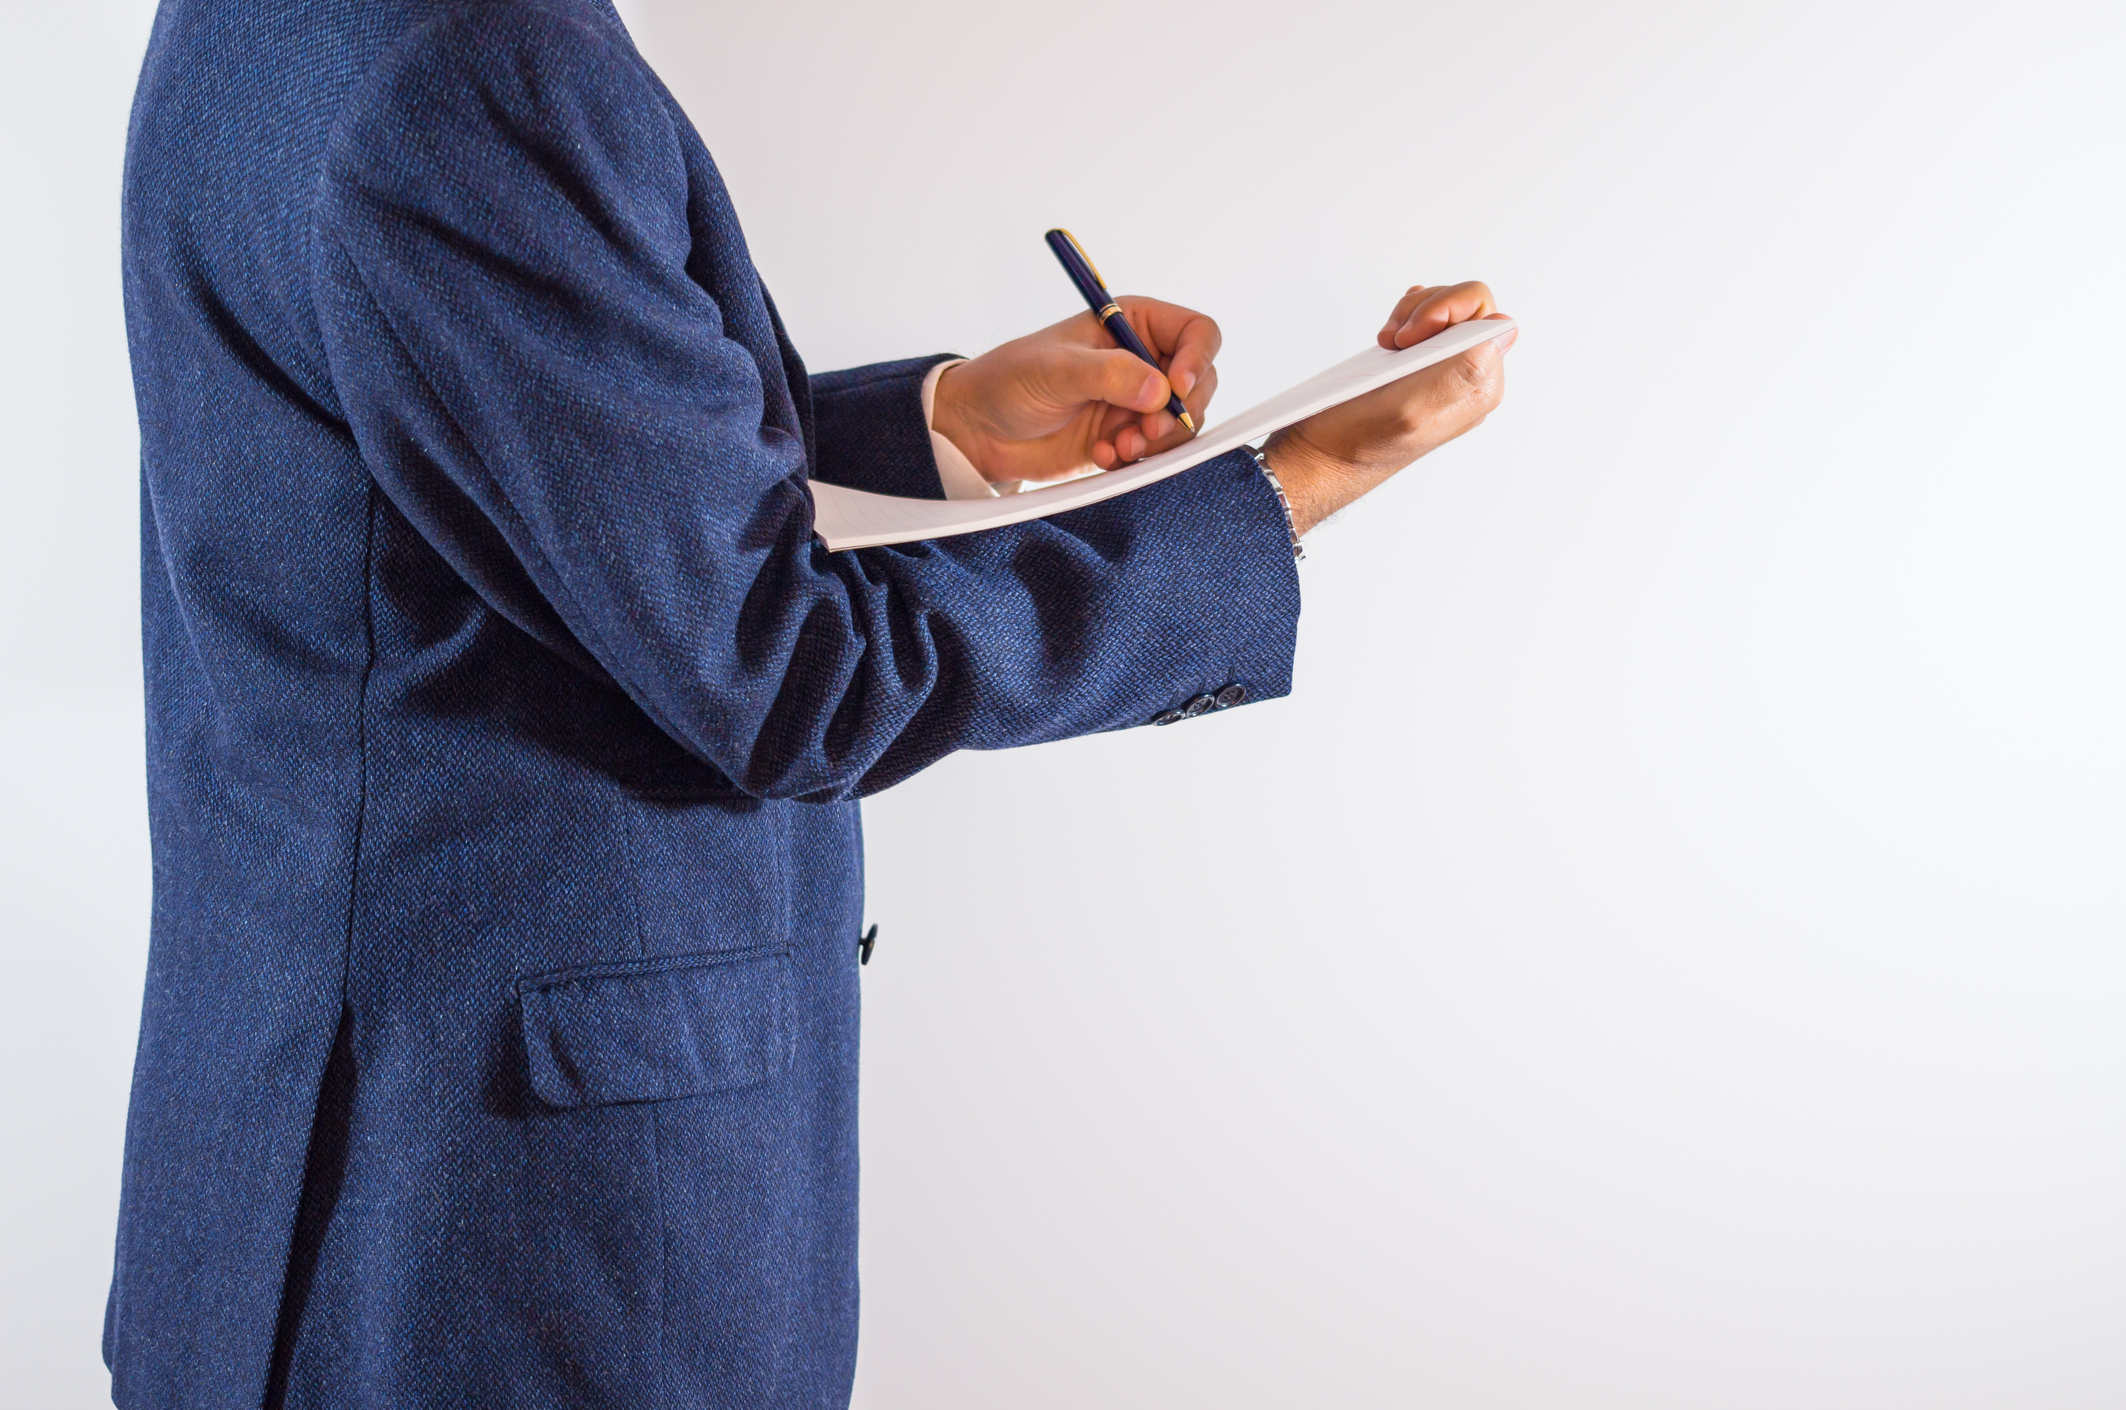 Figure in suit Surveyors down-valuing properties